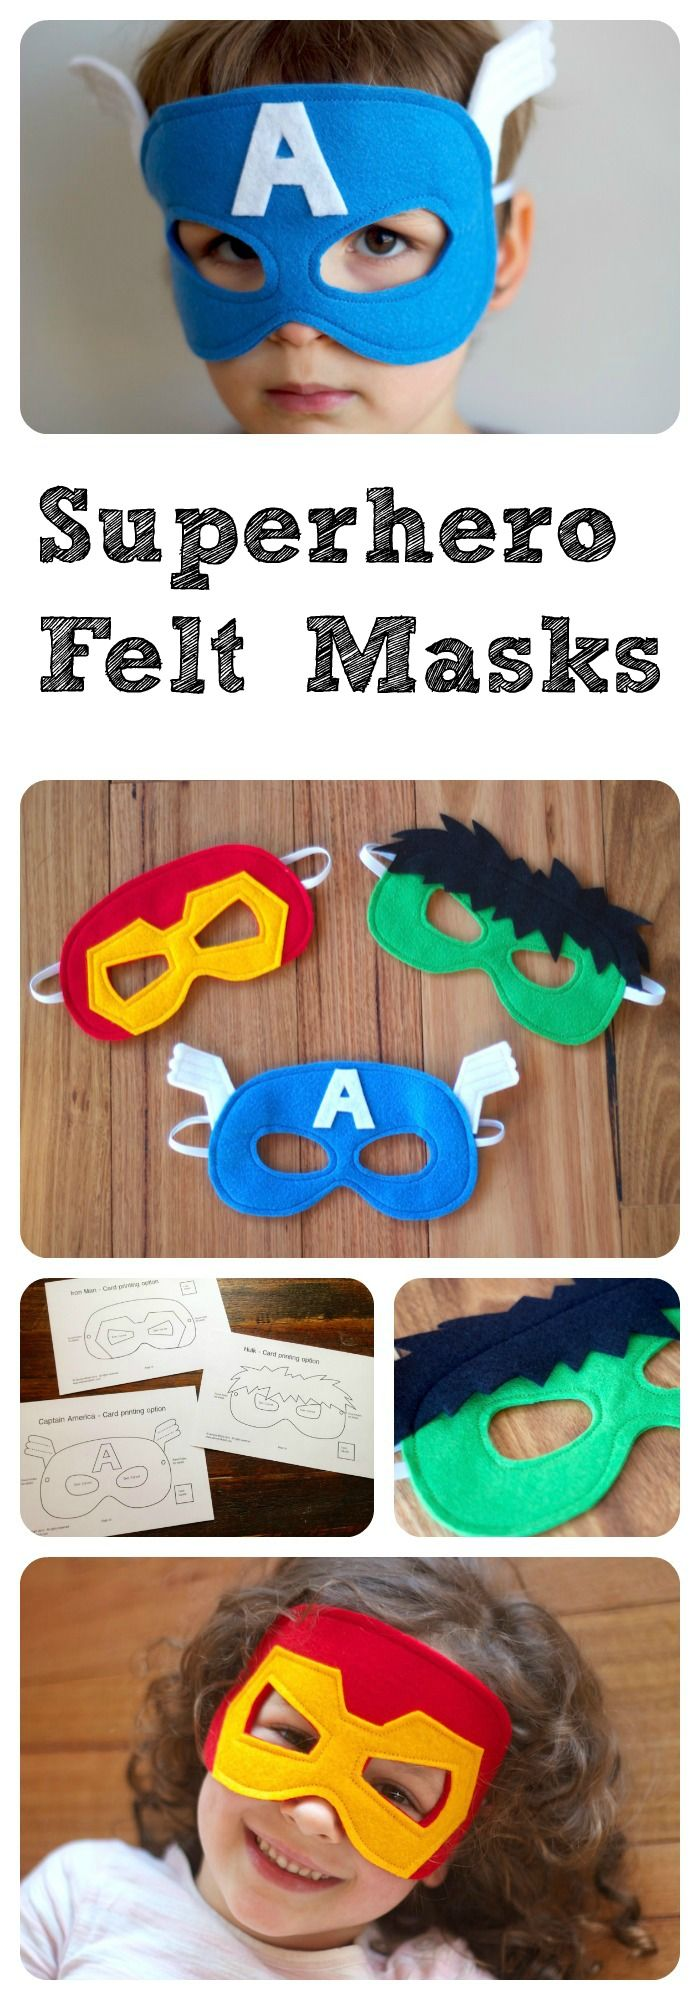 Superhero Felt Masks - A PDF sewing pattern - Captain America, Hulk and Ironman - Visit to grab an amazing super hero shirt now on sale!